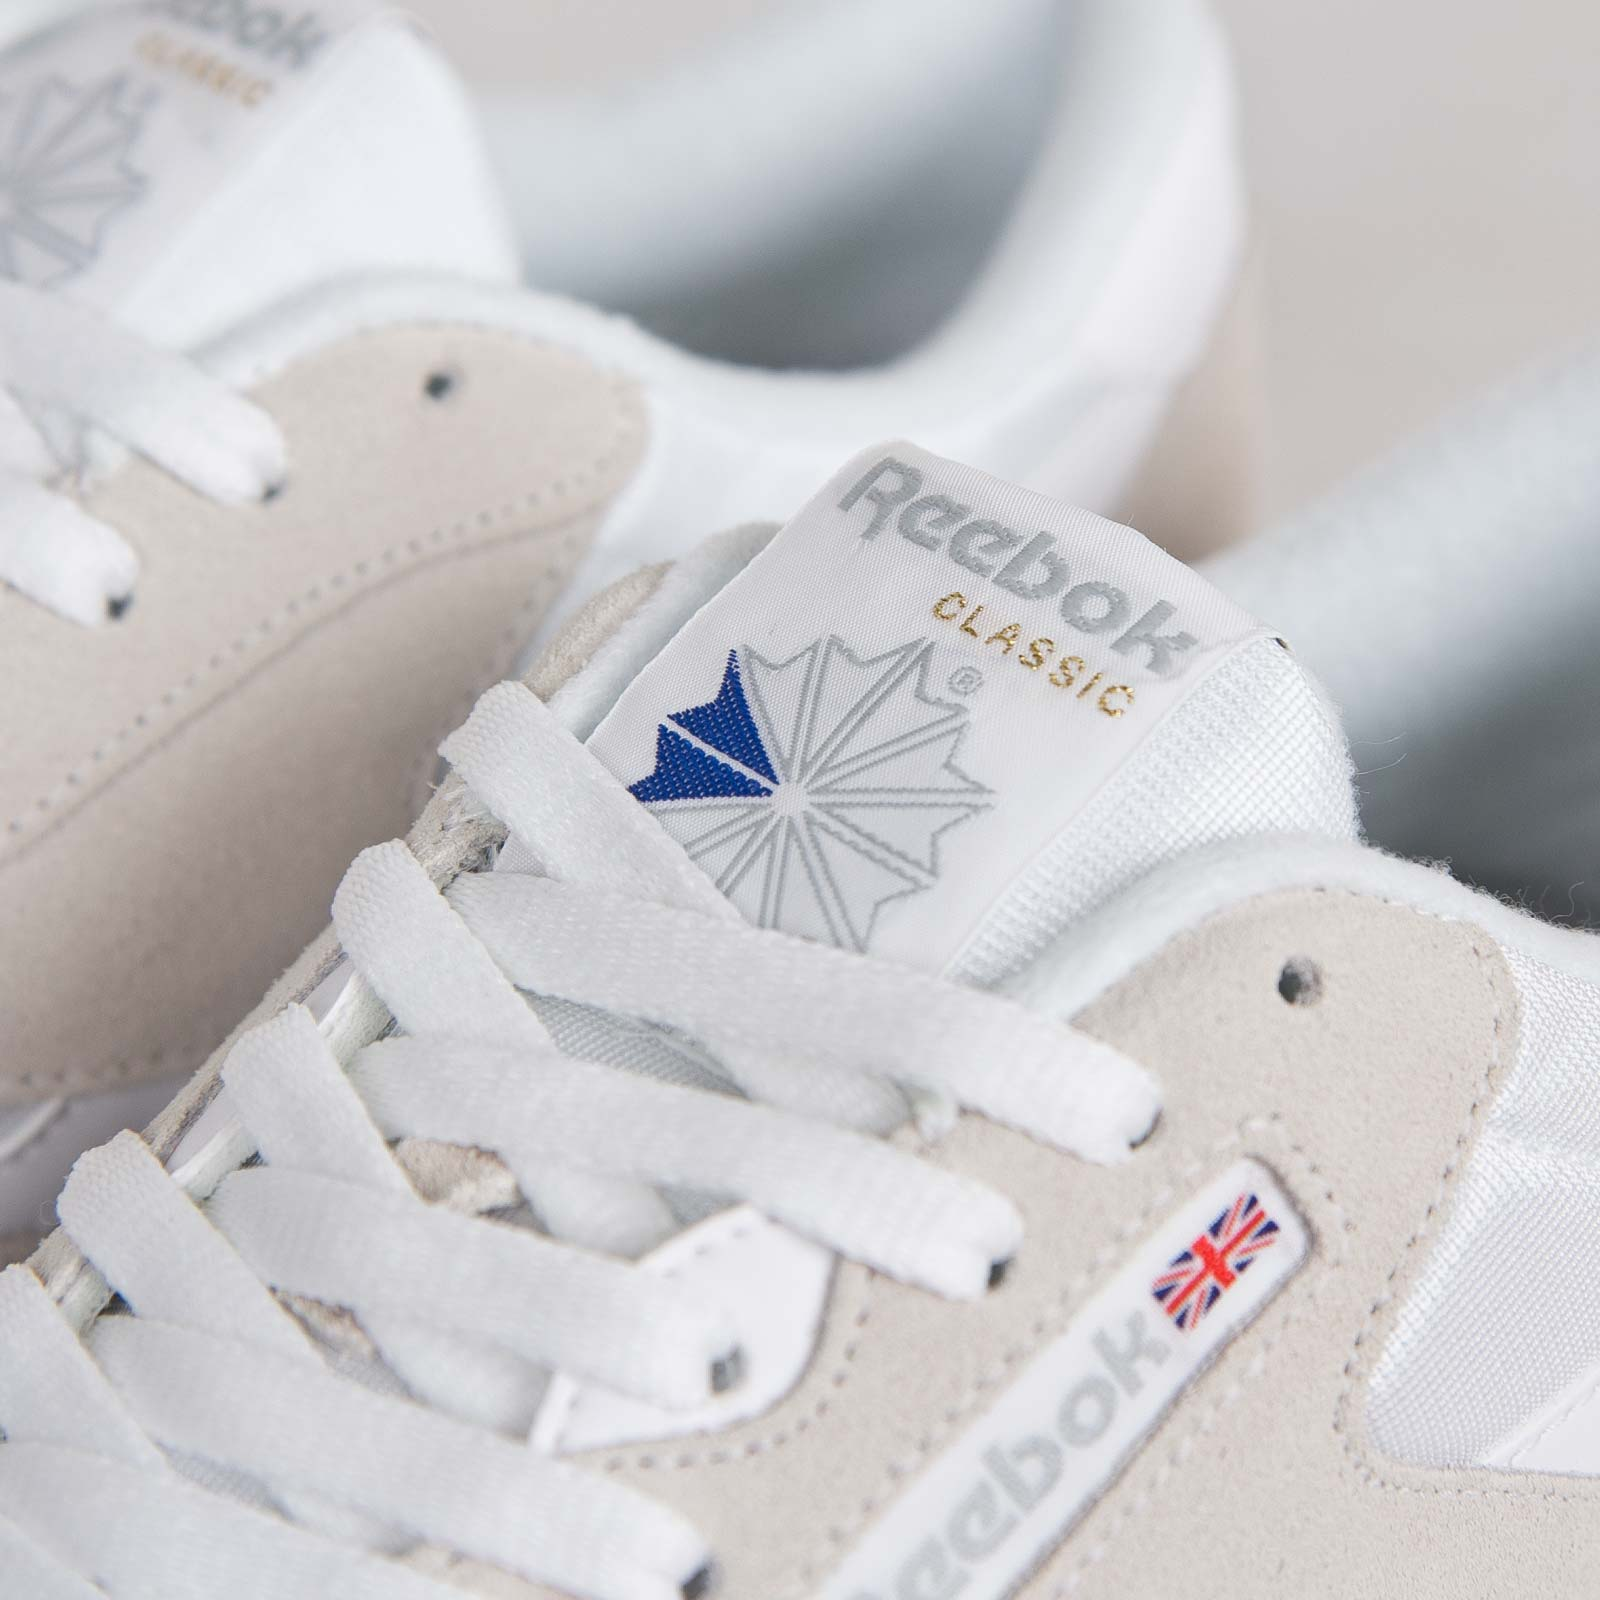 Reebok Classic Nylon - 6390 - Sneakersnstuff  79348fa57